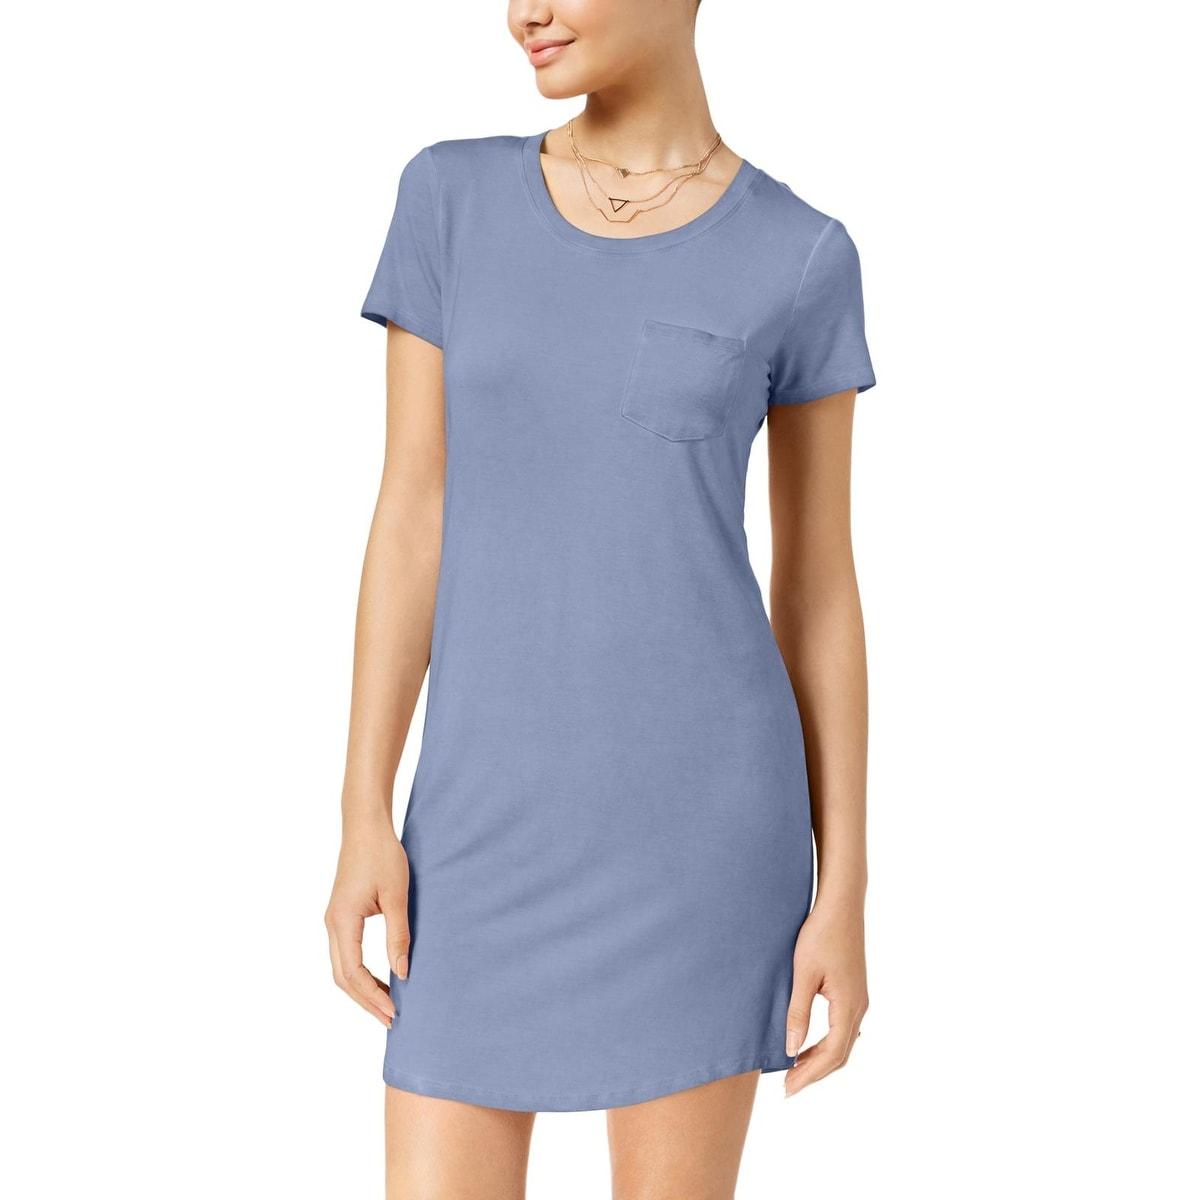 Ultra Flirt Womens Pocket Marled Shift Dress